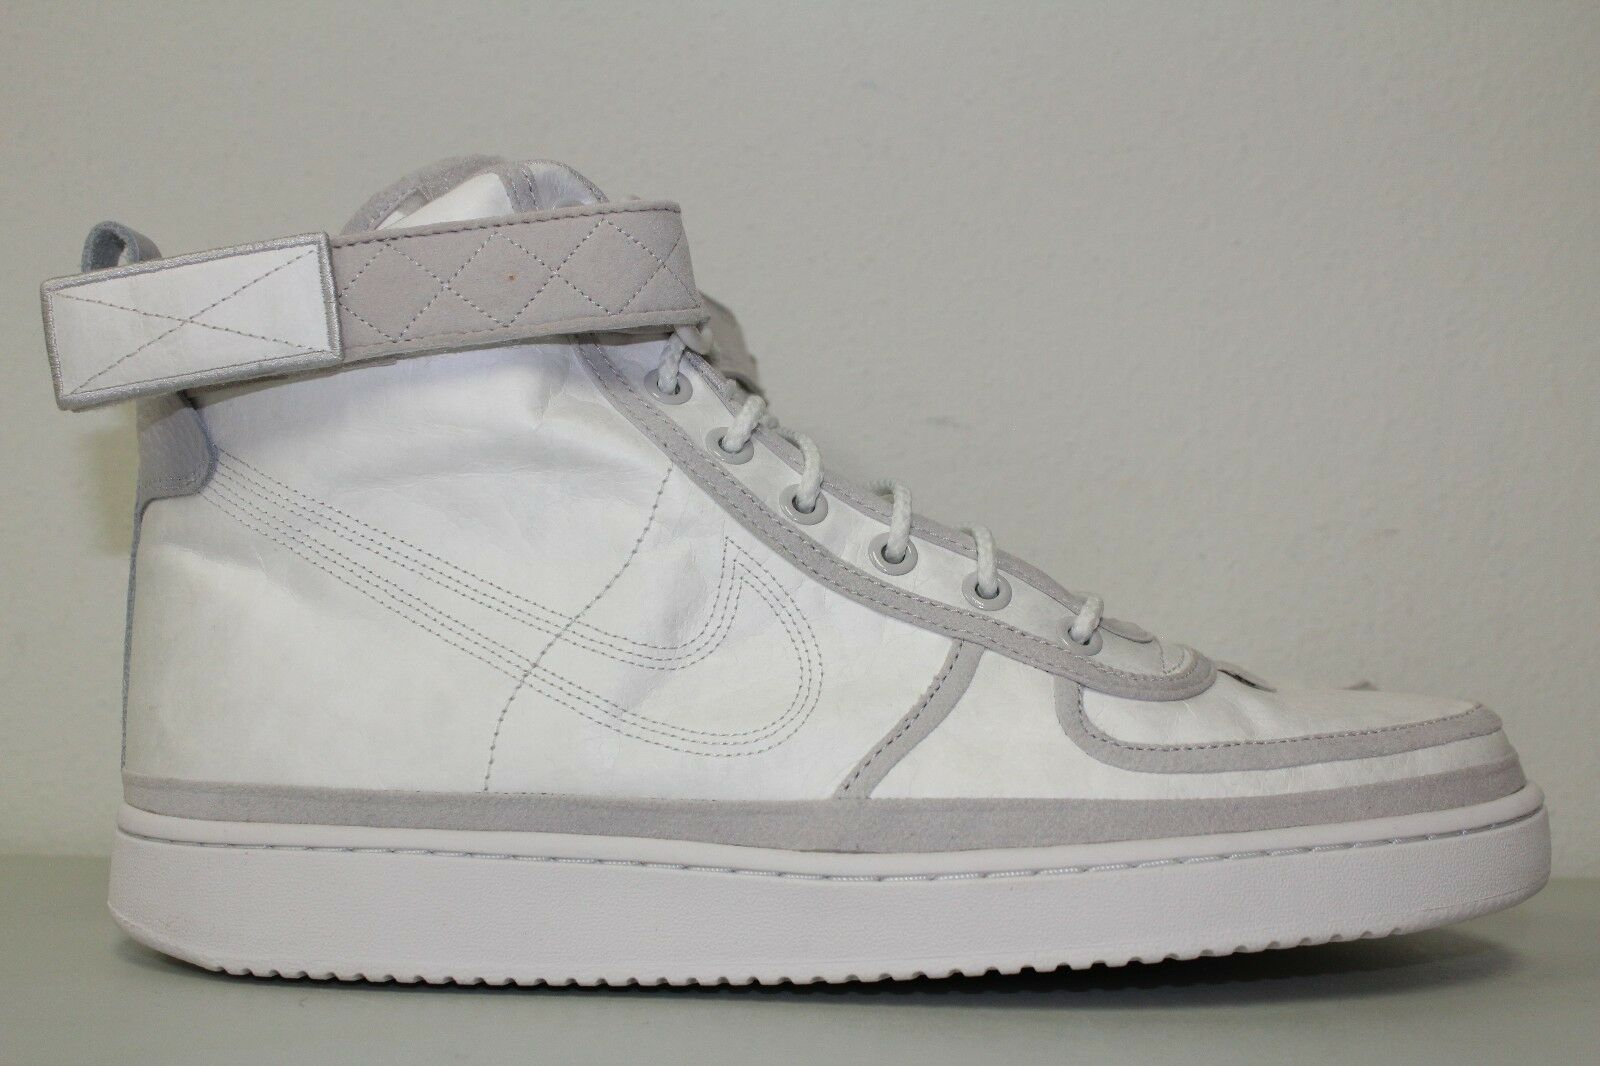 Nike Uomo vandalo alto supremo come qs 90 sz / 10 sz 90 10,5 allstar weekend aq0113-001 d09eb0